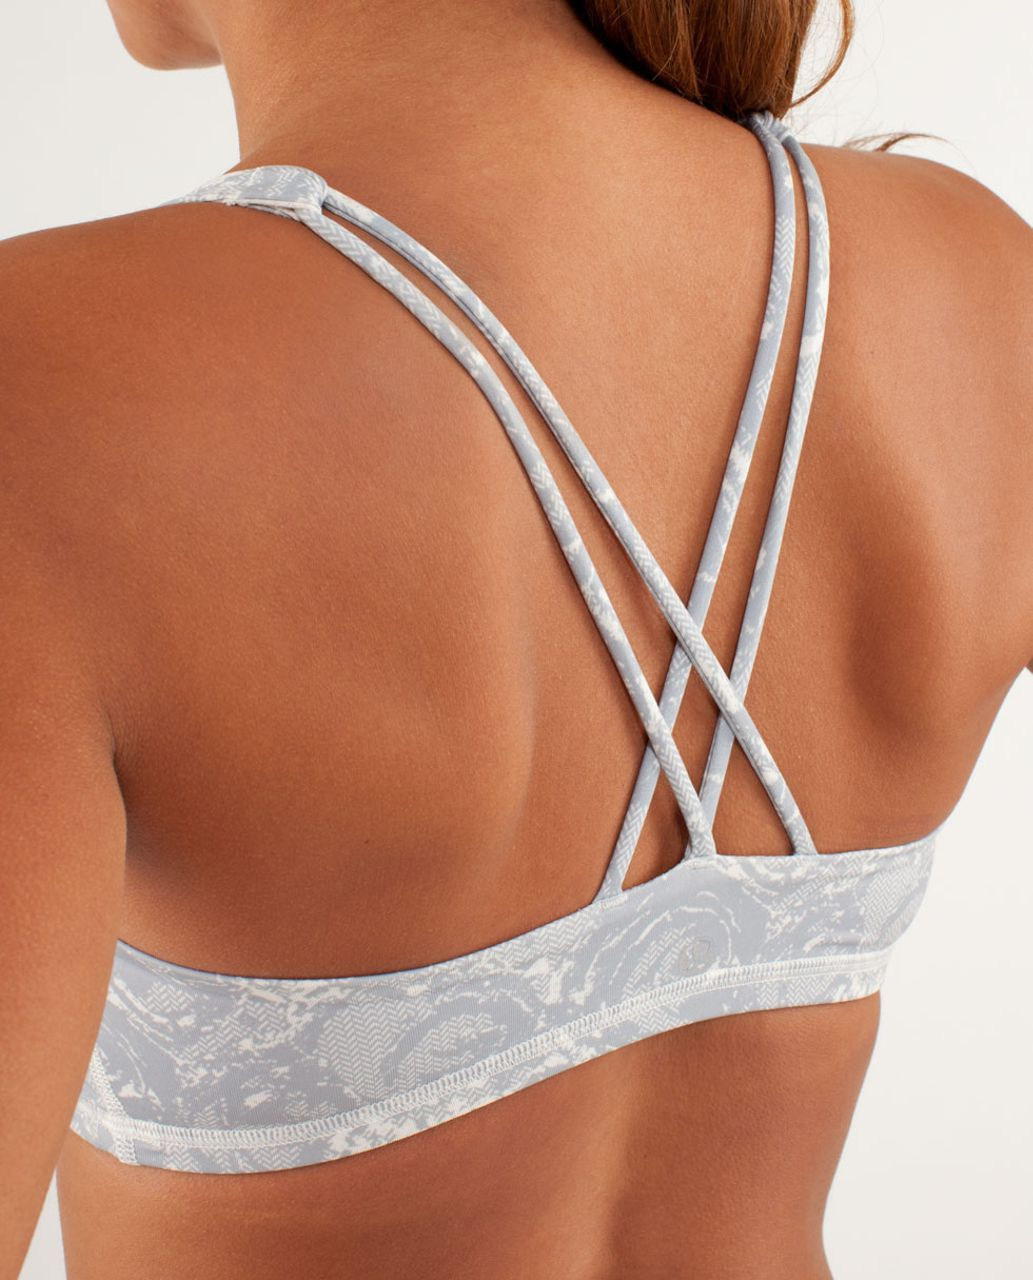 Lululemon Free To Be Bra - Rose Herringbone Printed Polar Cream Silver Slate